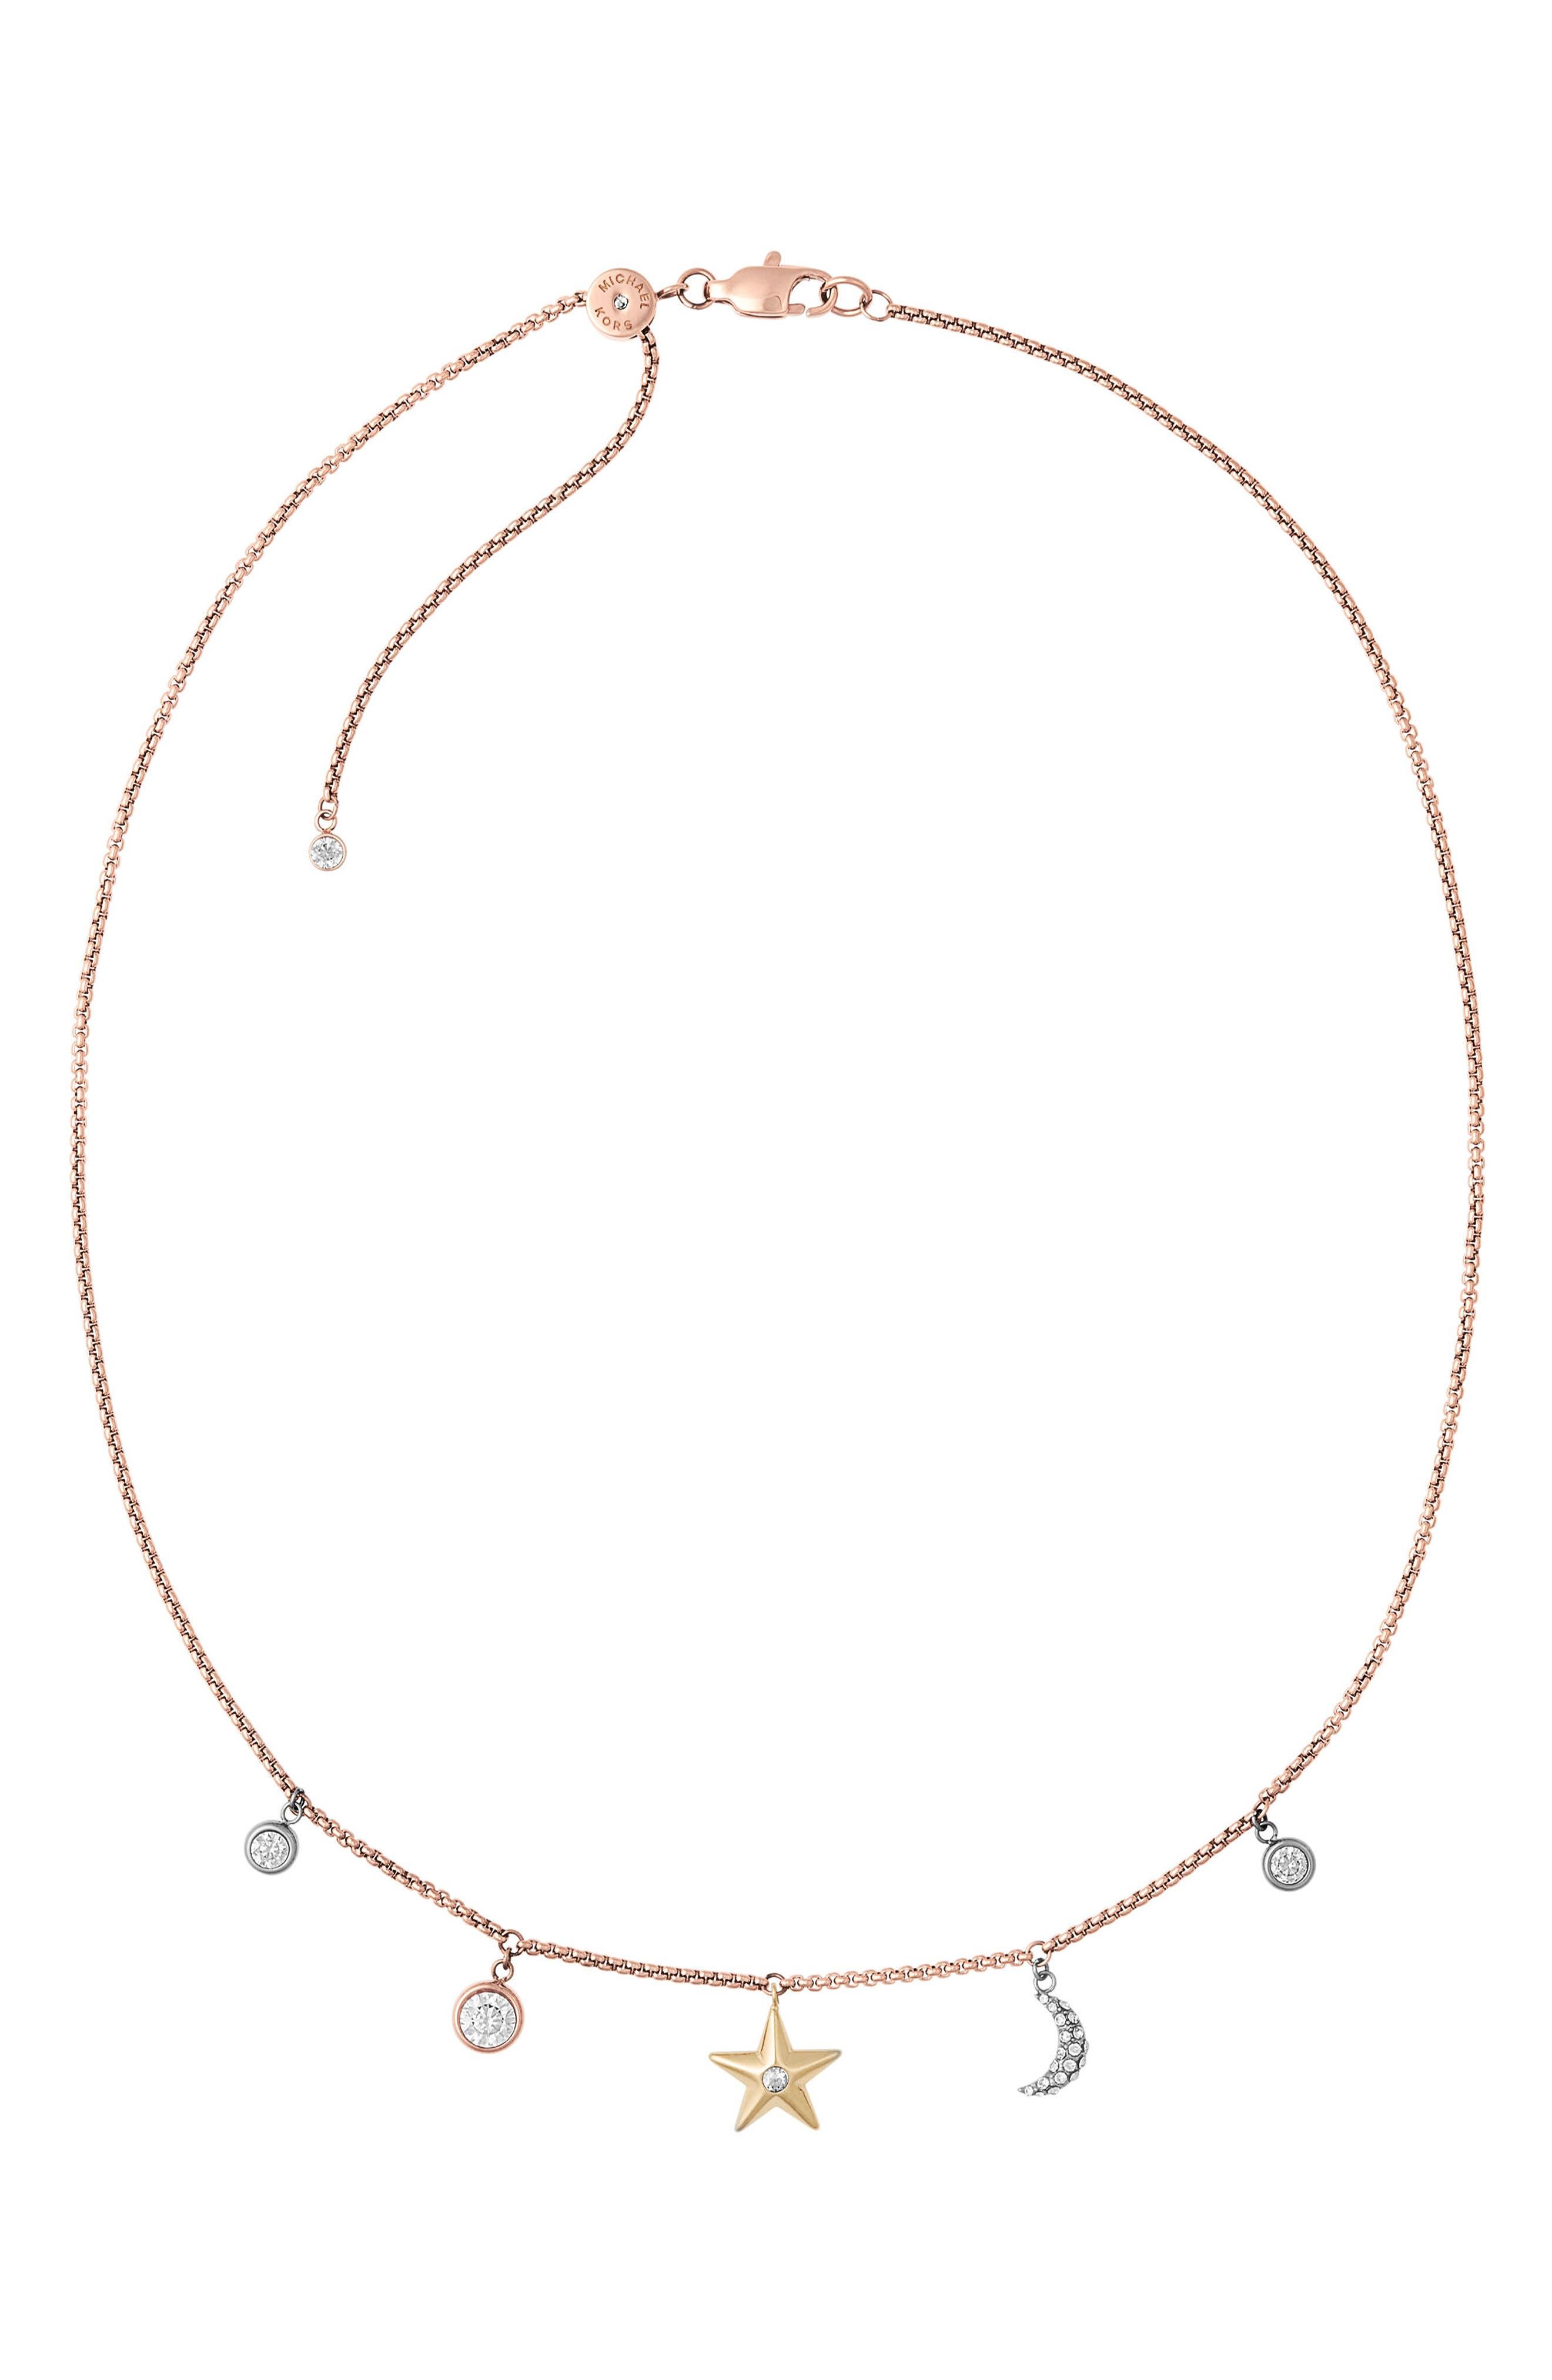 Michael Kors Crystal Charm Necklace